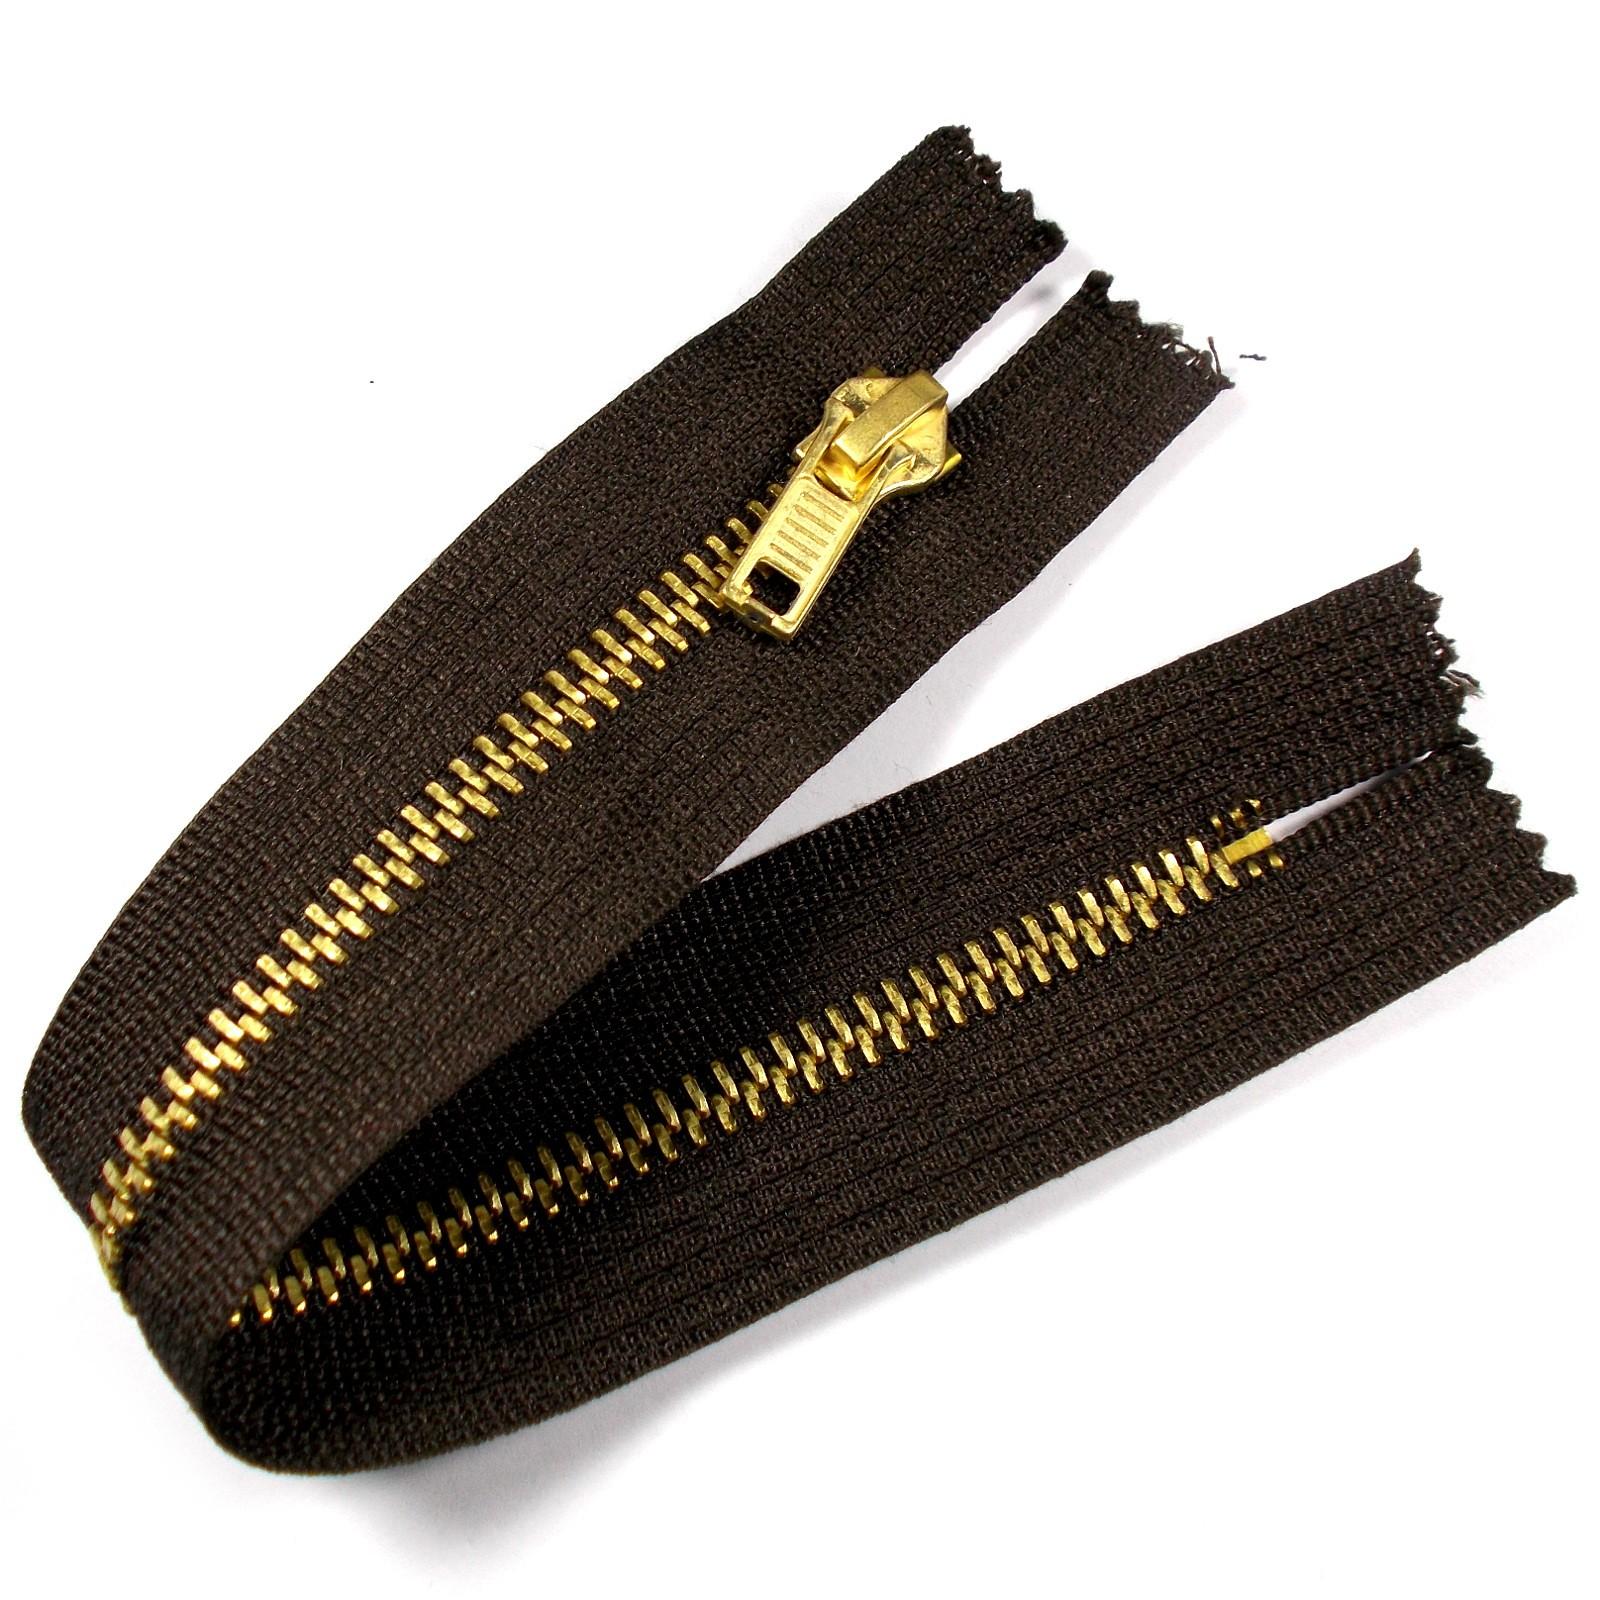 Gold Metal Trouser Jeans Zip Zipper 8 inch Brown